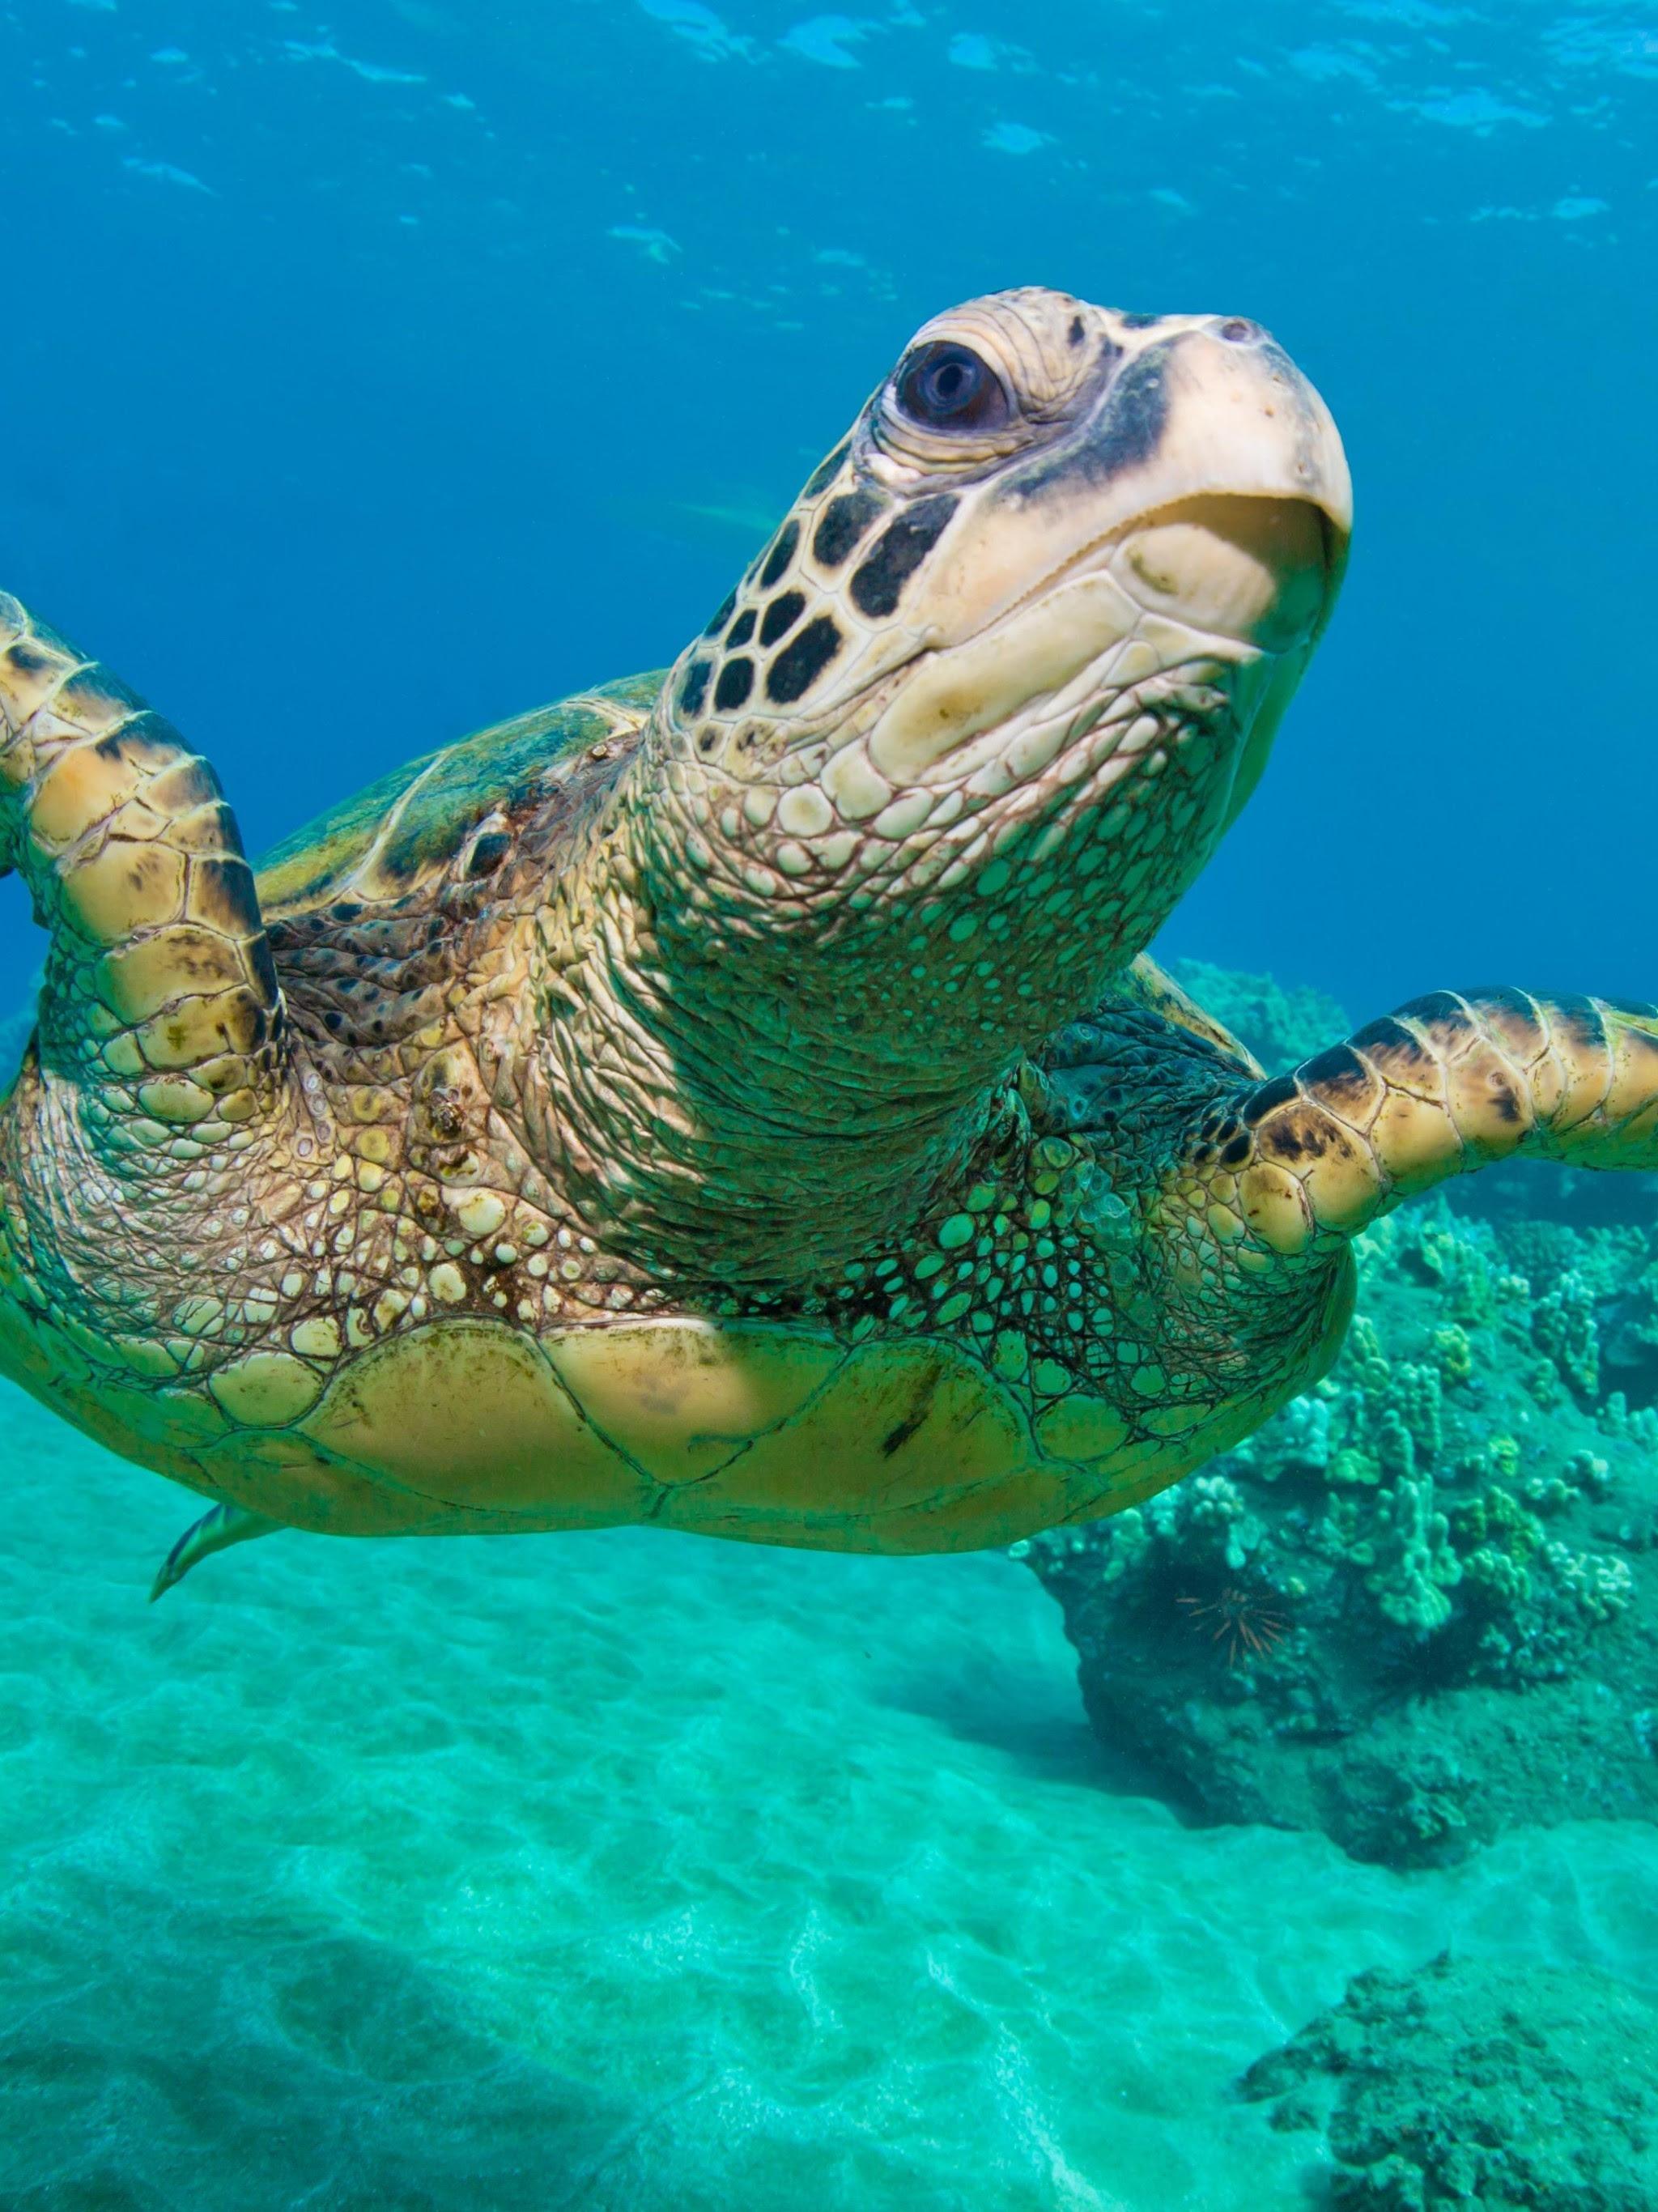 Sea Turtle Wallpaper Desktop (69+ images)